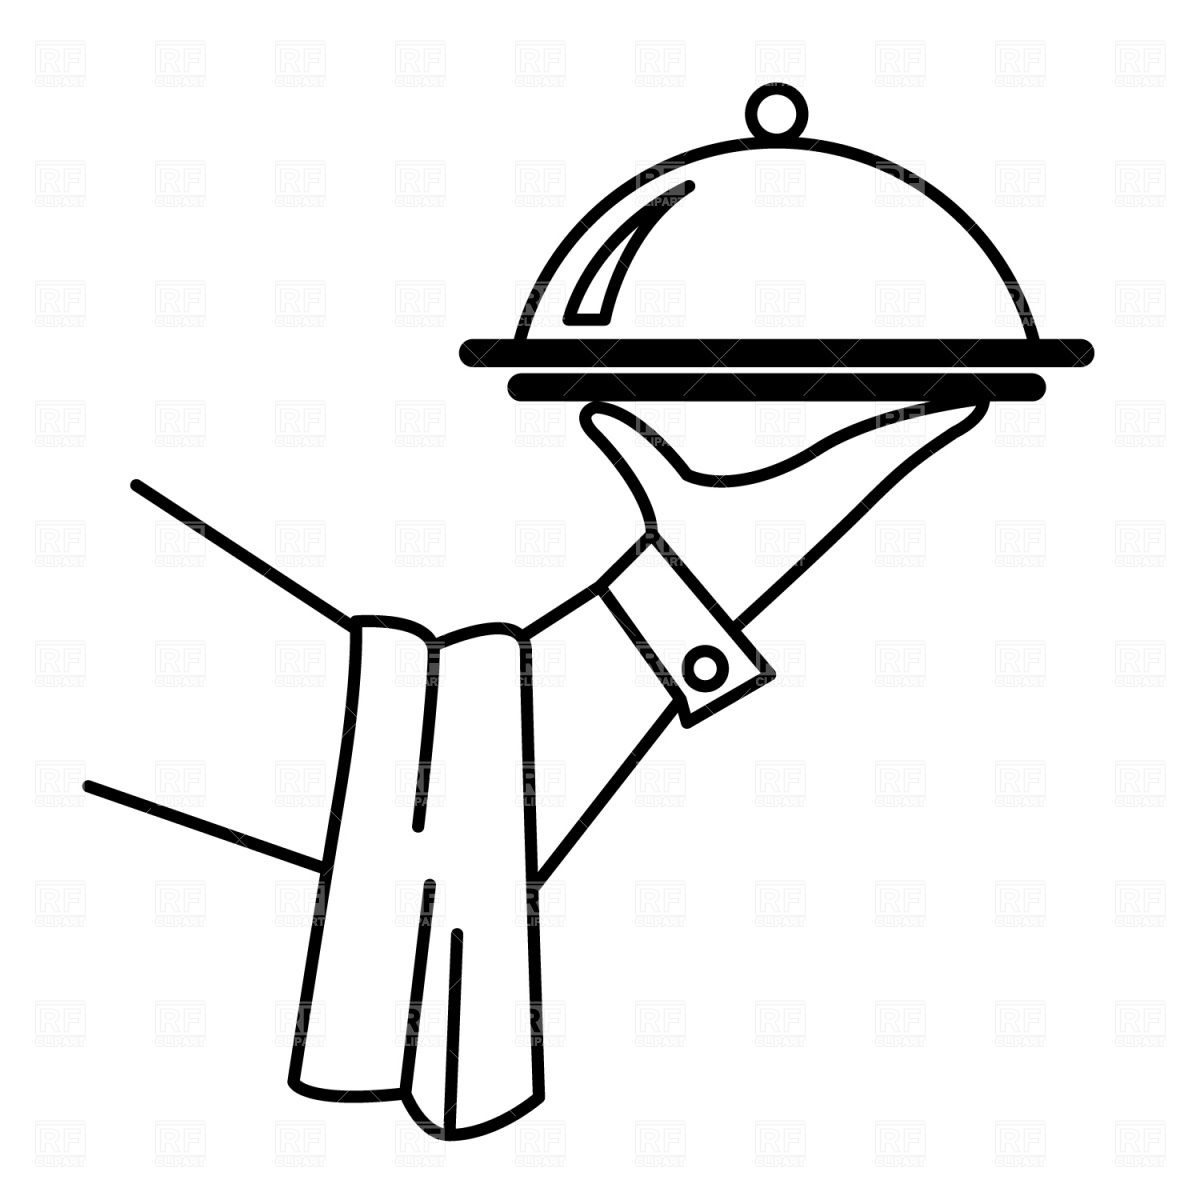 Waiter S Hand With Tray Clipart Panda